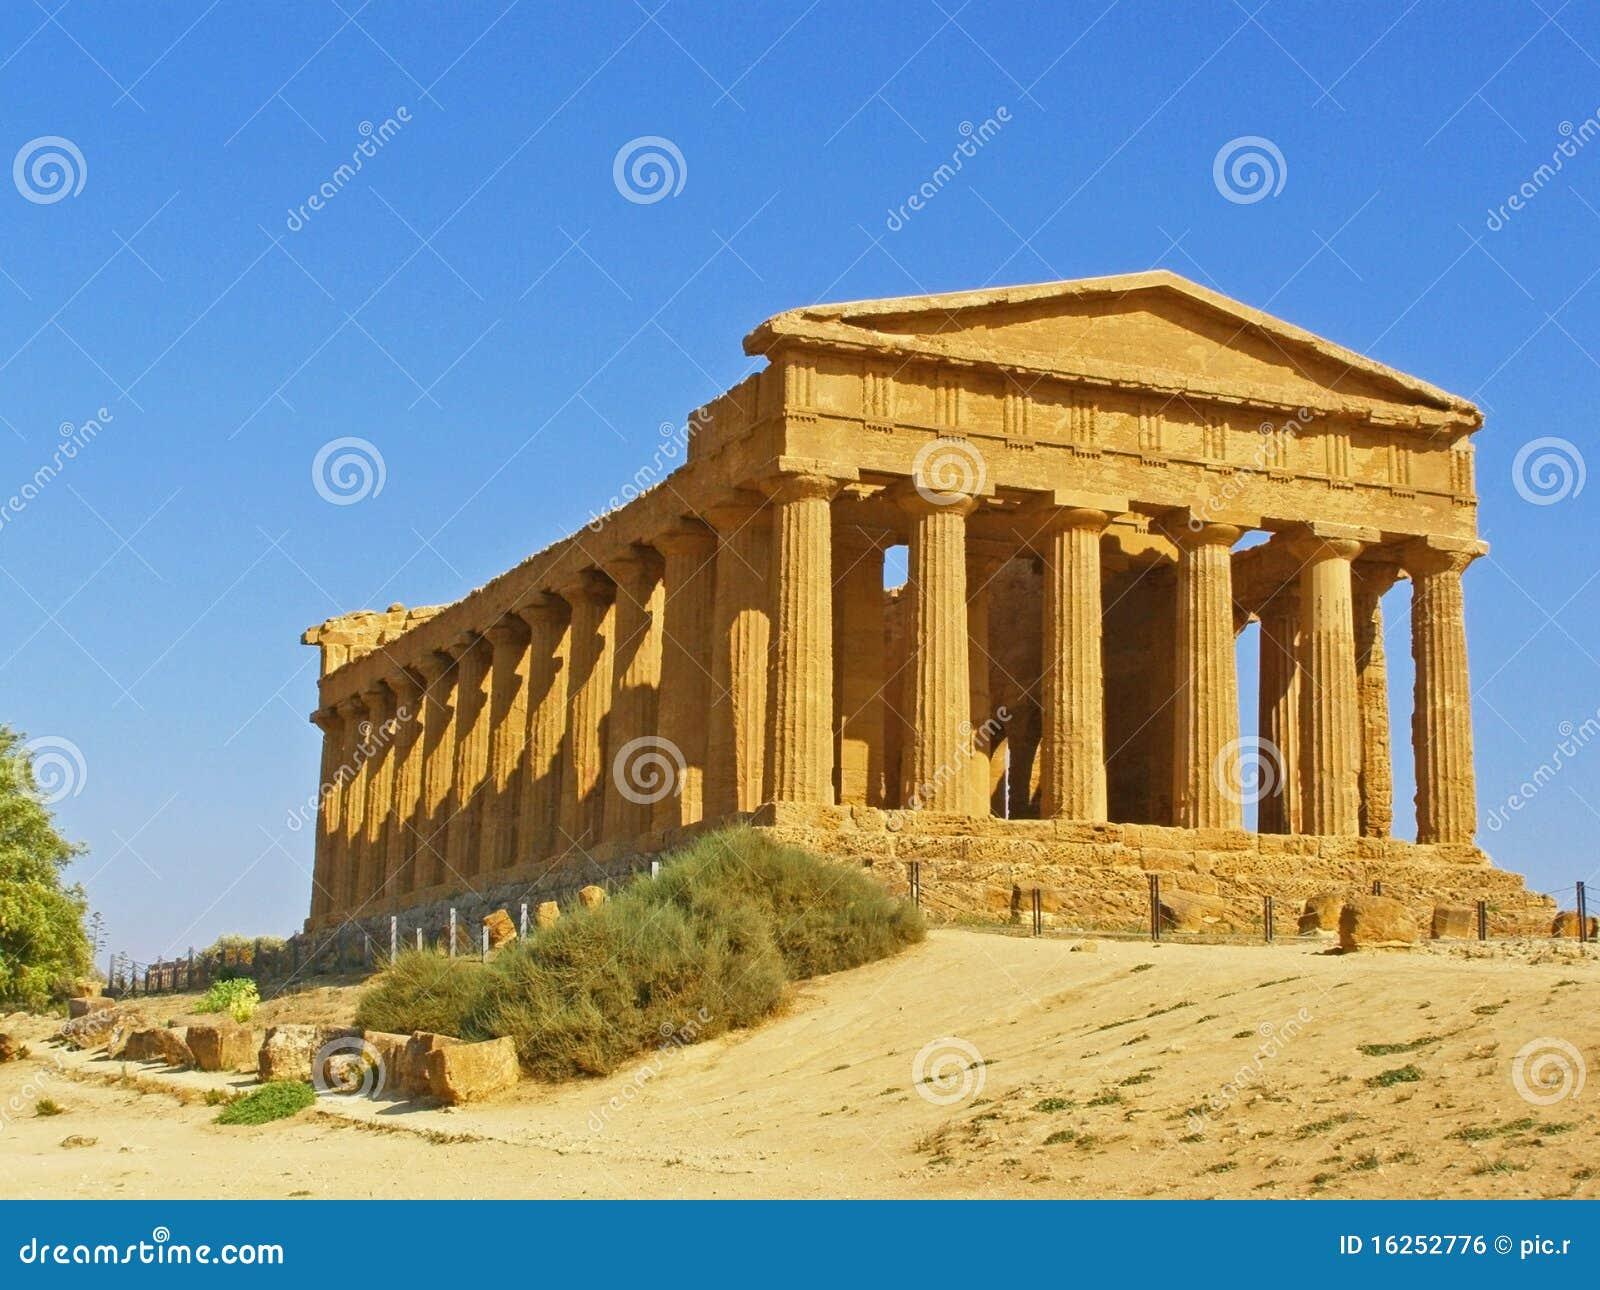 Oude griekse tempel royalty vrije stock afbeelding afbeelding 16252776 - Oude griekse decoratie ...